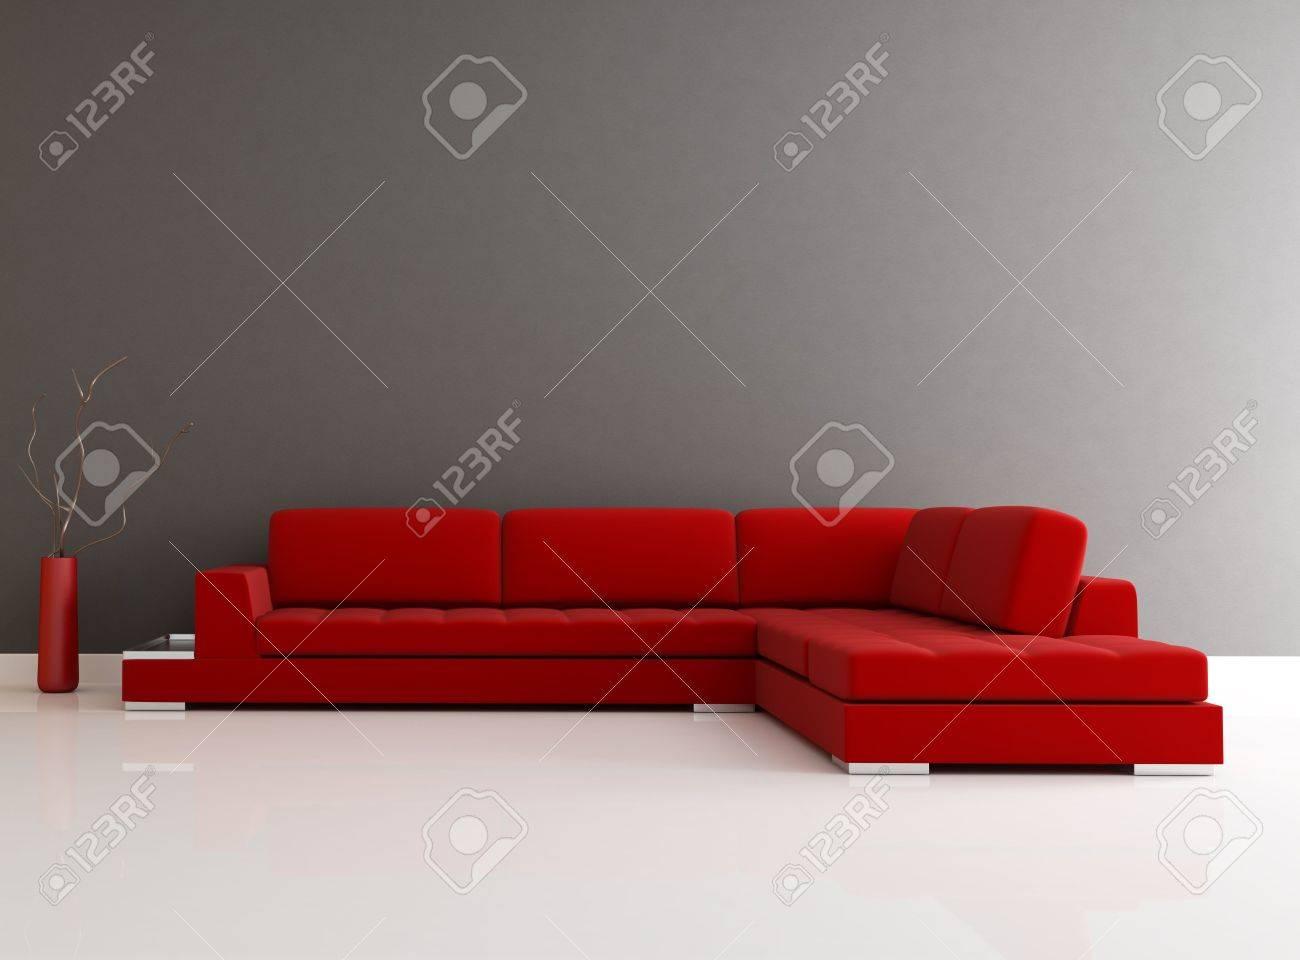 Red velvet sofa in a minimalist lounge rendering stock photo 6187158